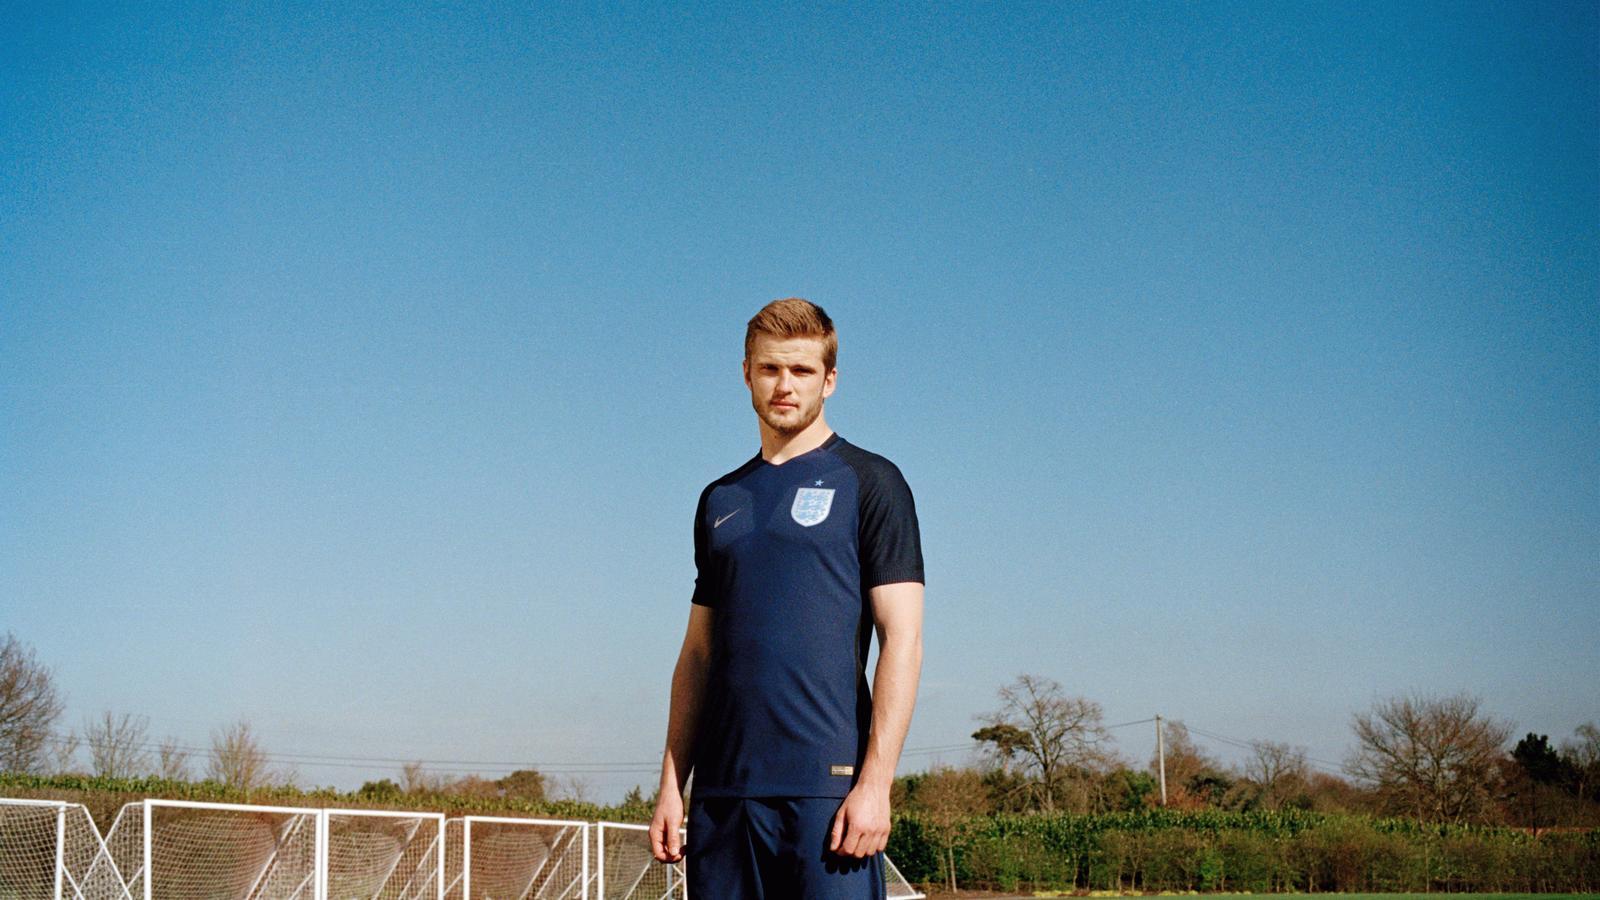 Nike_-_England_-_Eric_Dier_hd_1600